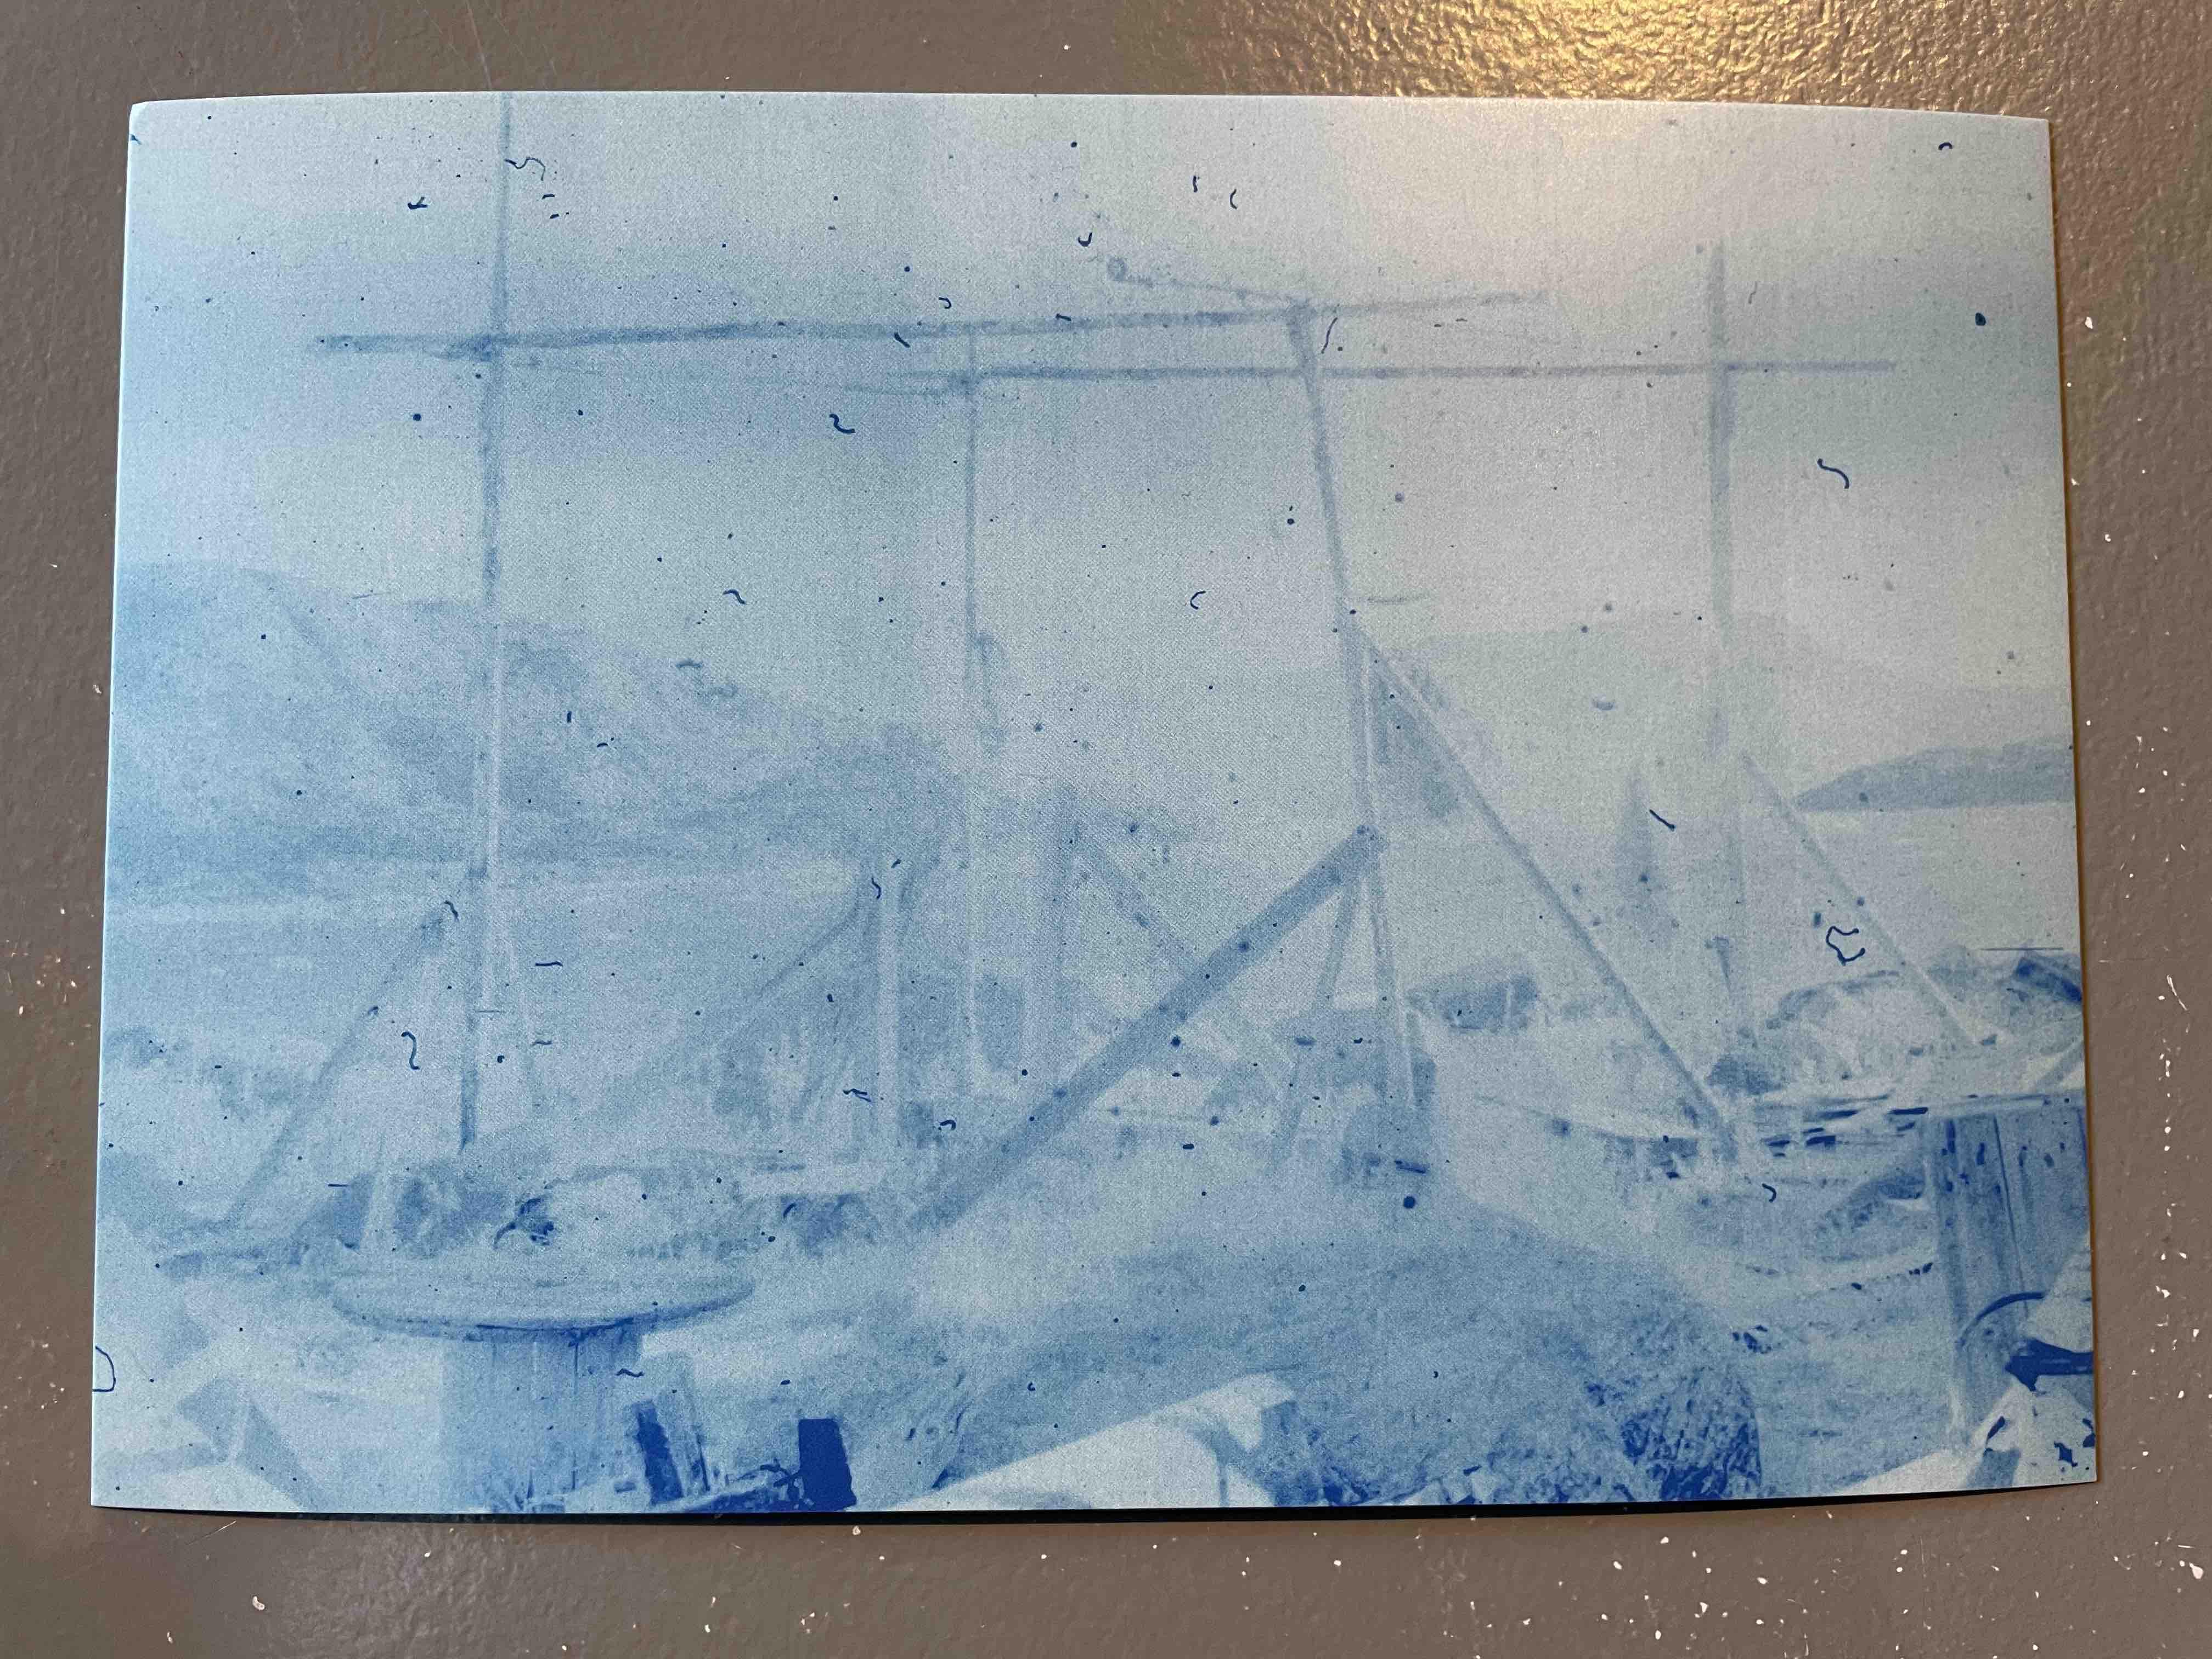 IKERASAK postkort